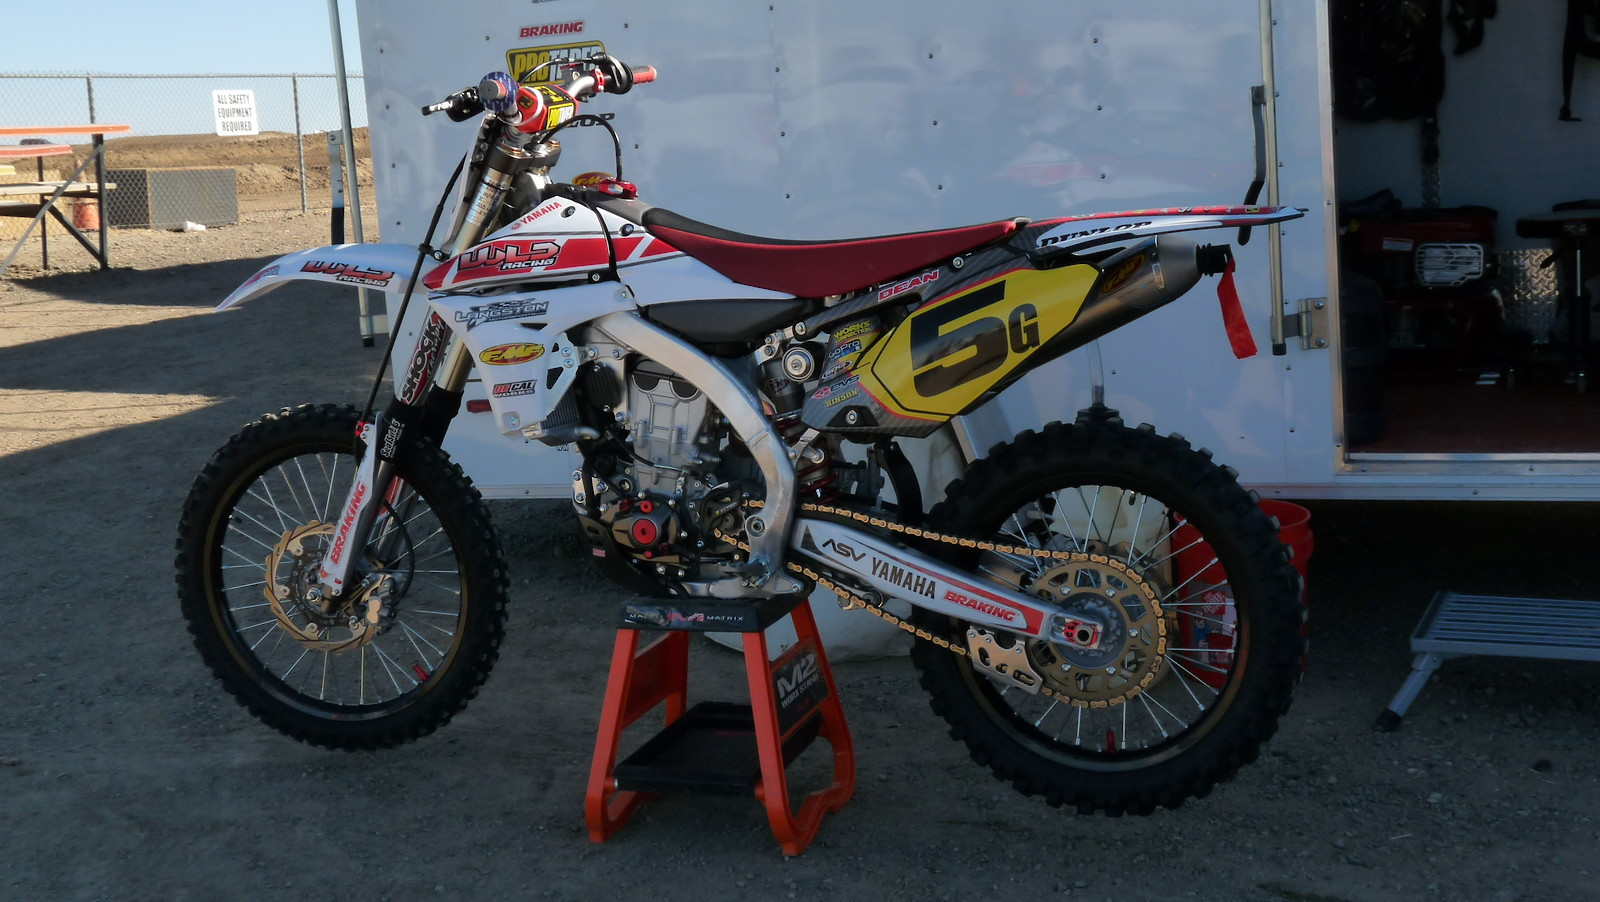 P1230525 - WLD - Motocross Pictures - Vital MX